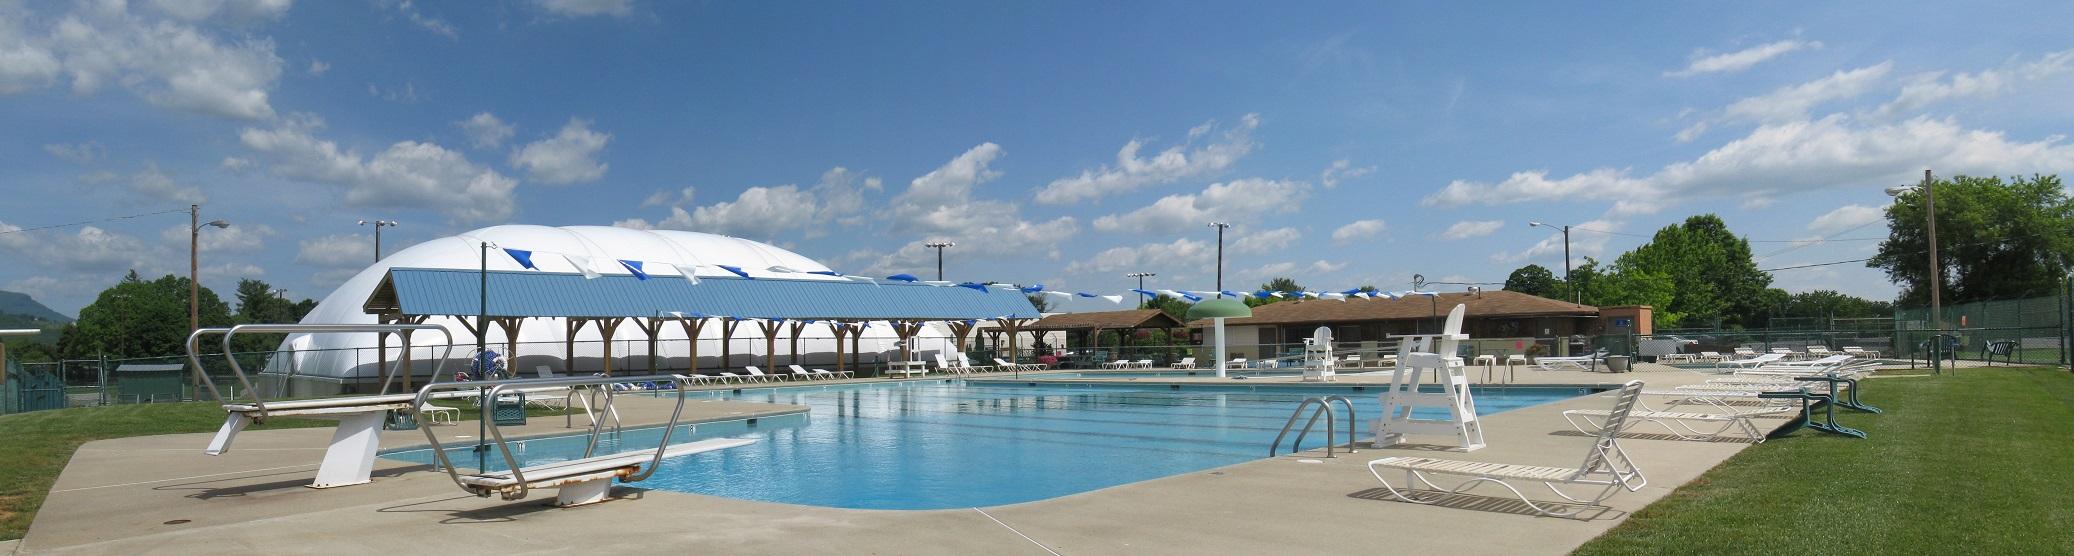 Lexington City Pool Ymca Of Virginia 39 S Blue Ridge